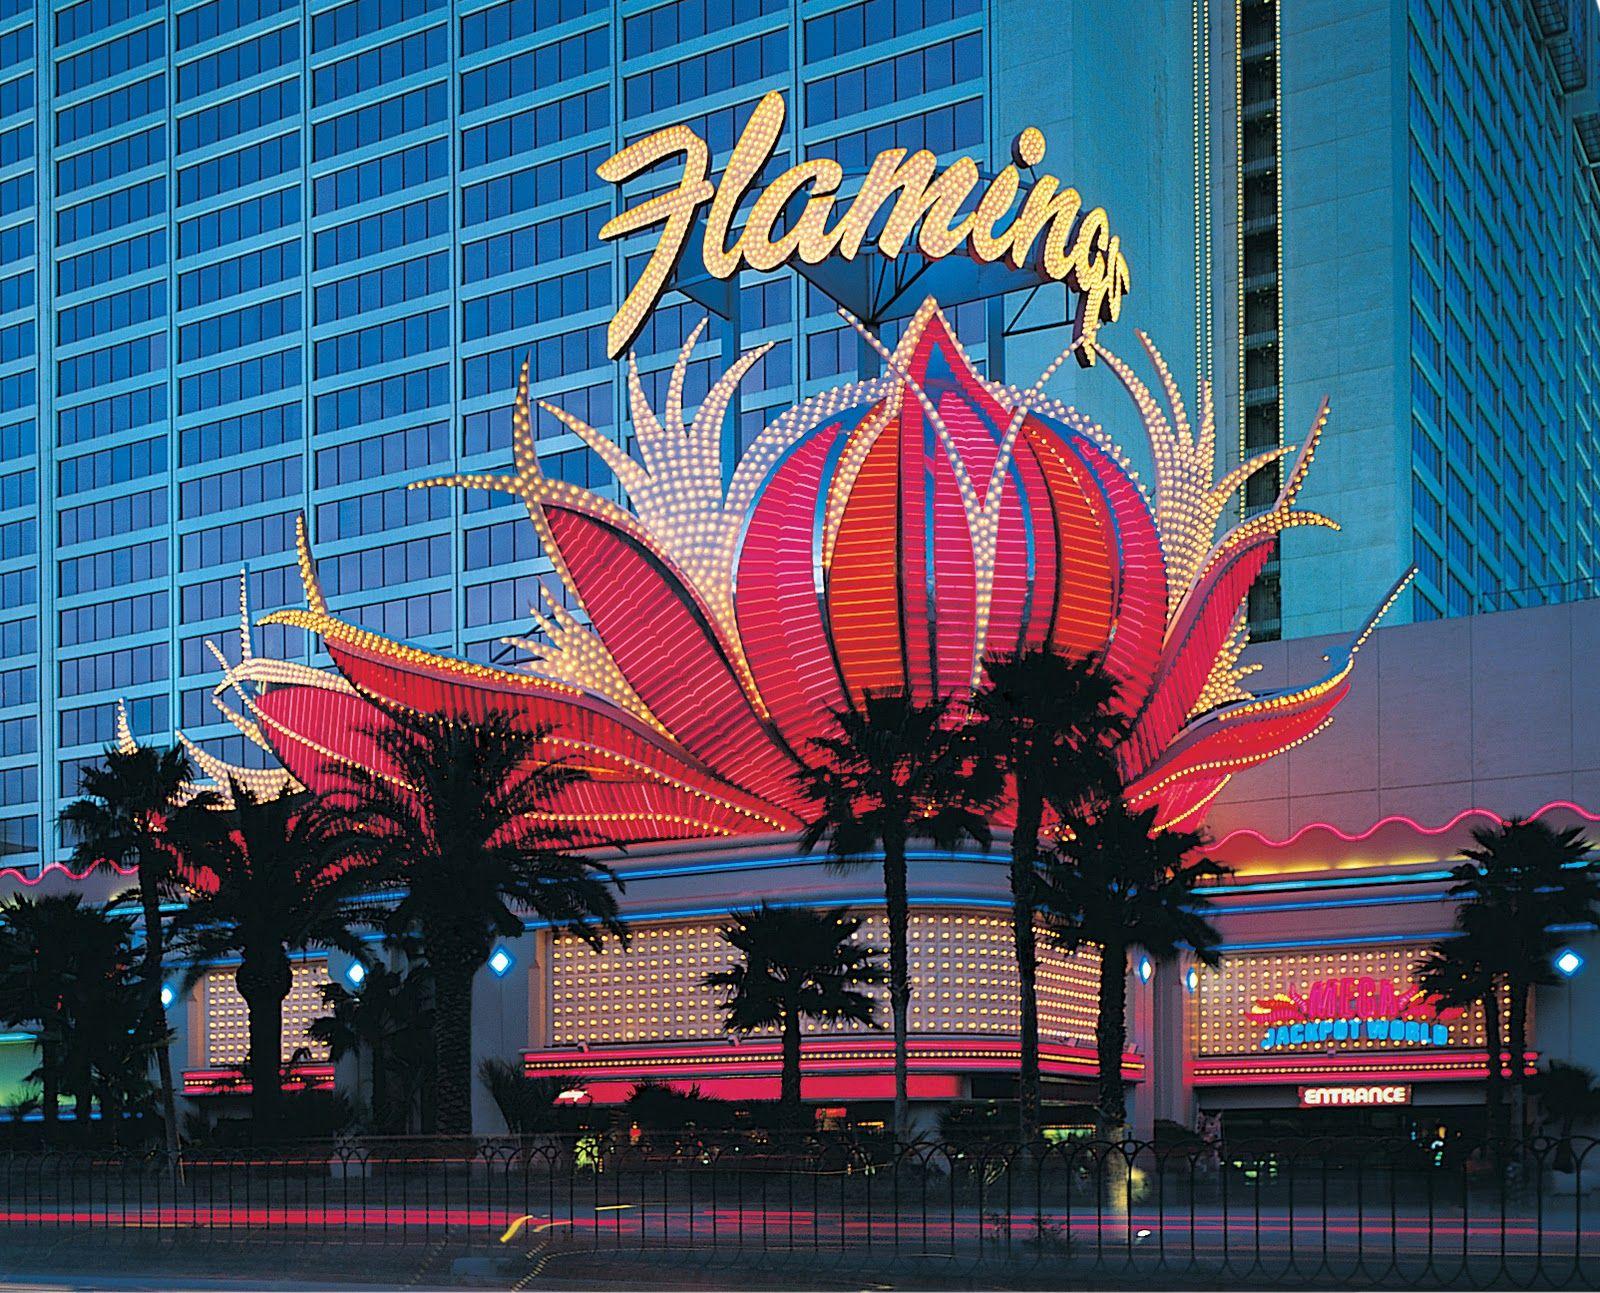 Flamingo hilton hotel and casino in las vegas nick xenophon online gambling